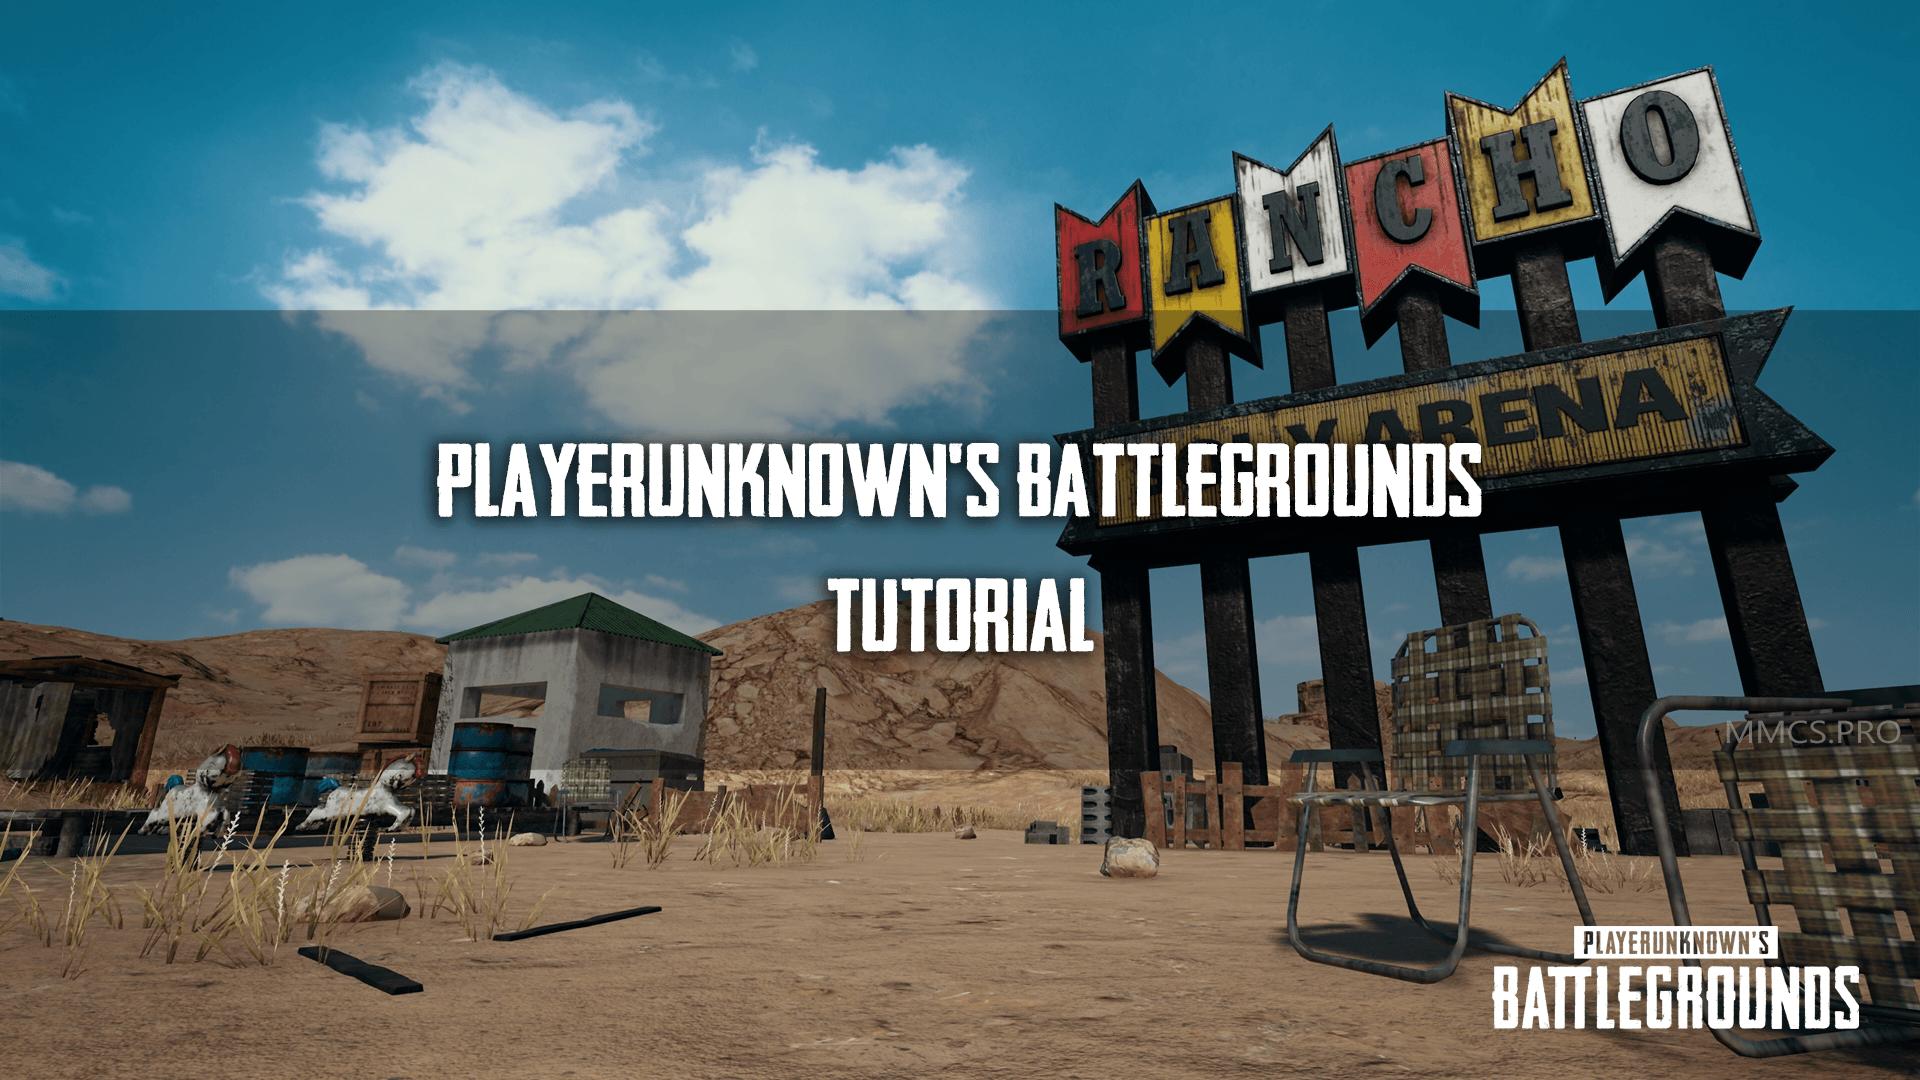 https://mmcs.pro/gajdy-po-igre-playerunknowns-battlegrounds/